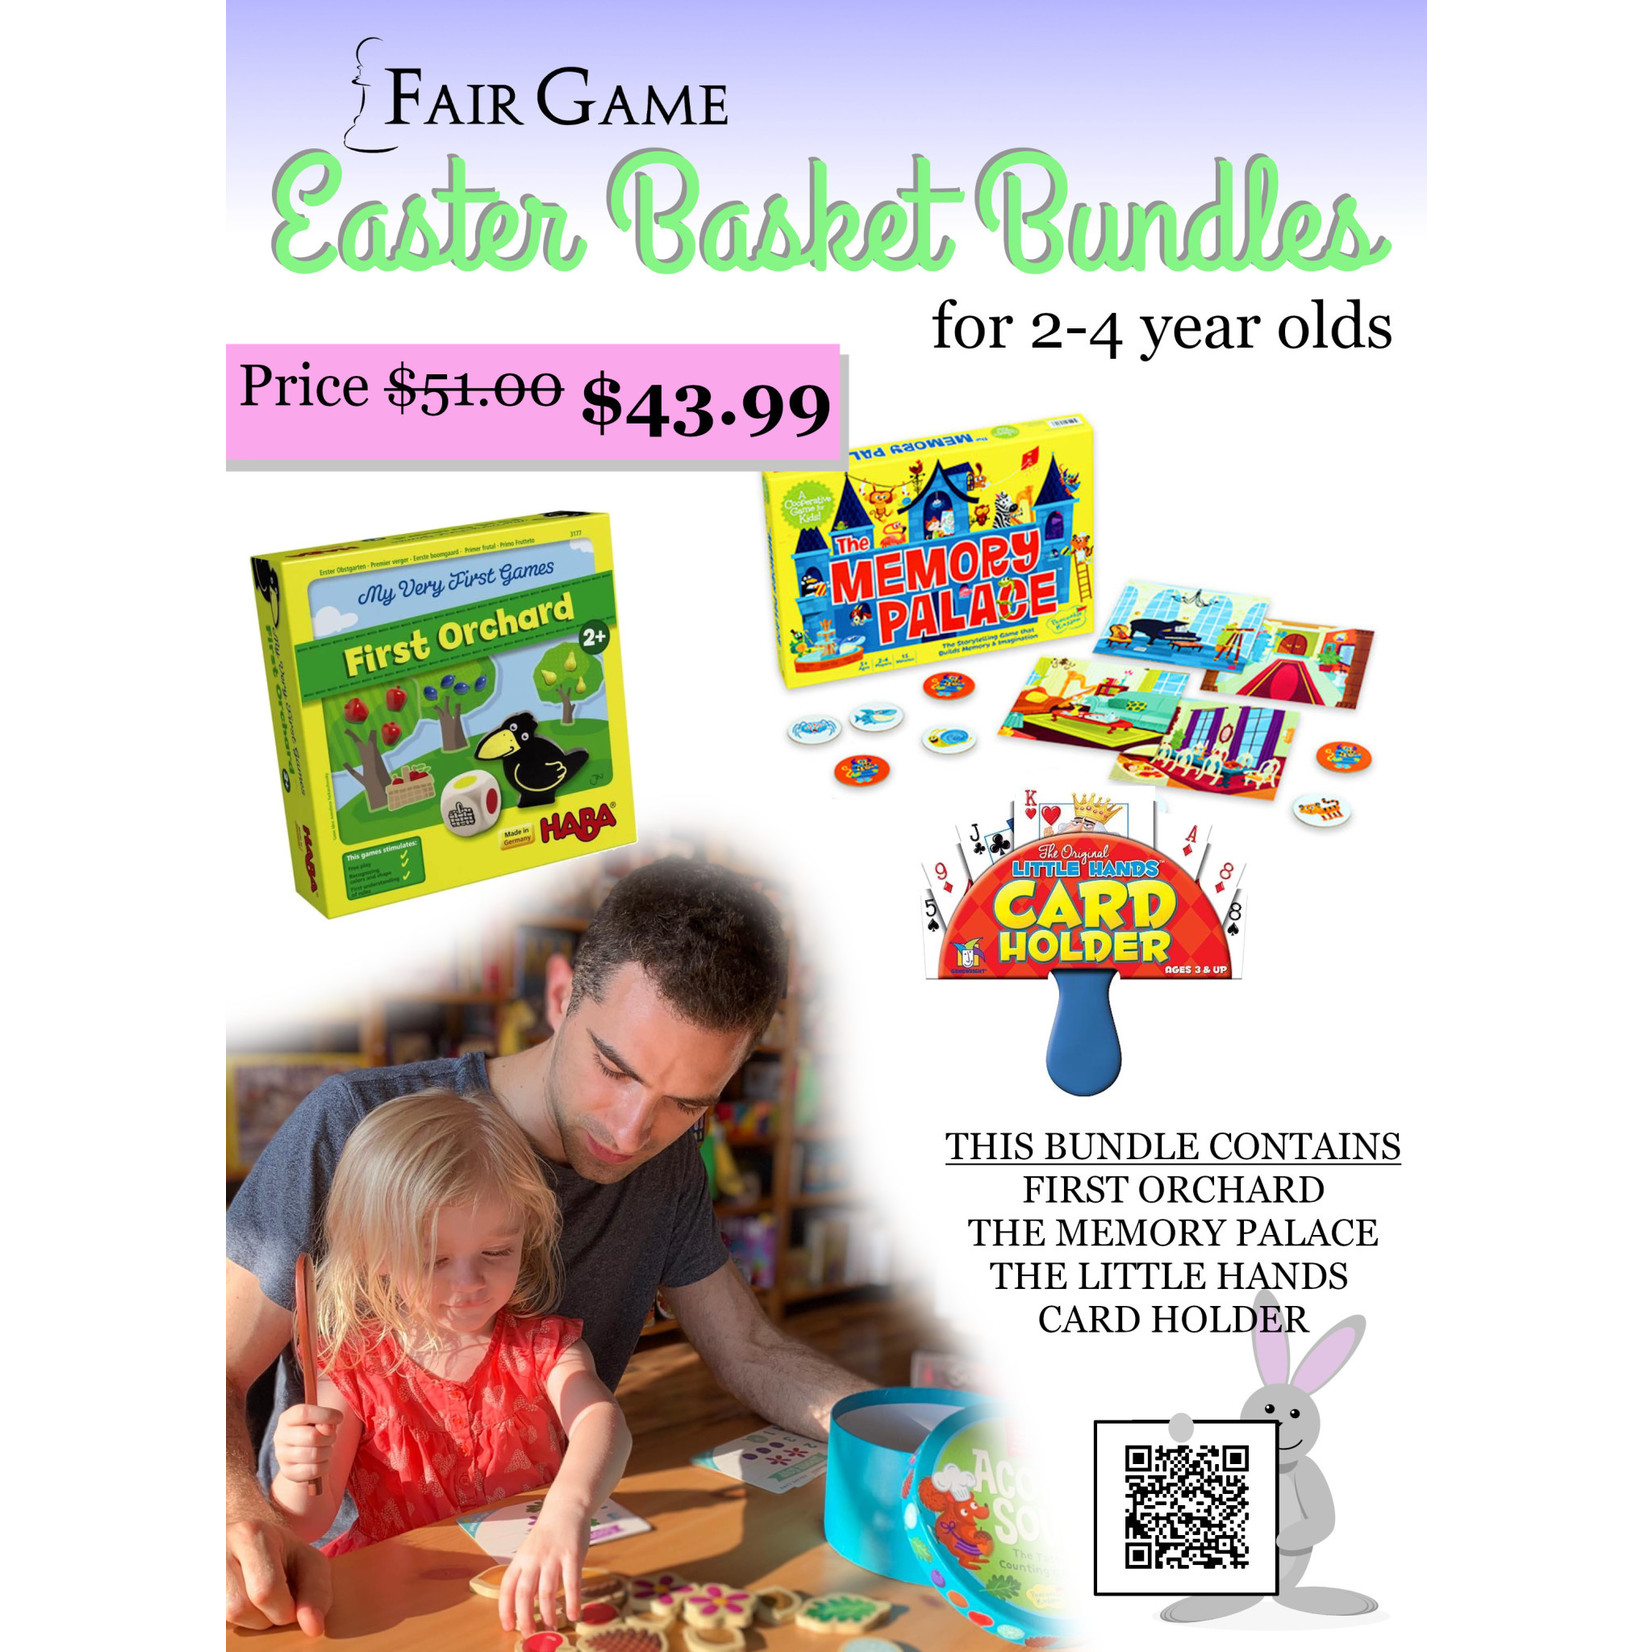 Fair Game Easter Basket Bundle for Ages 2-4